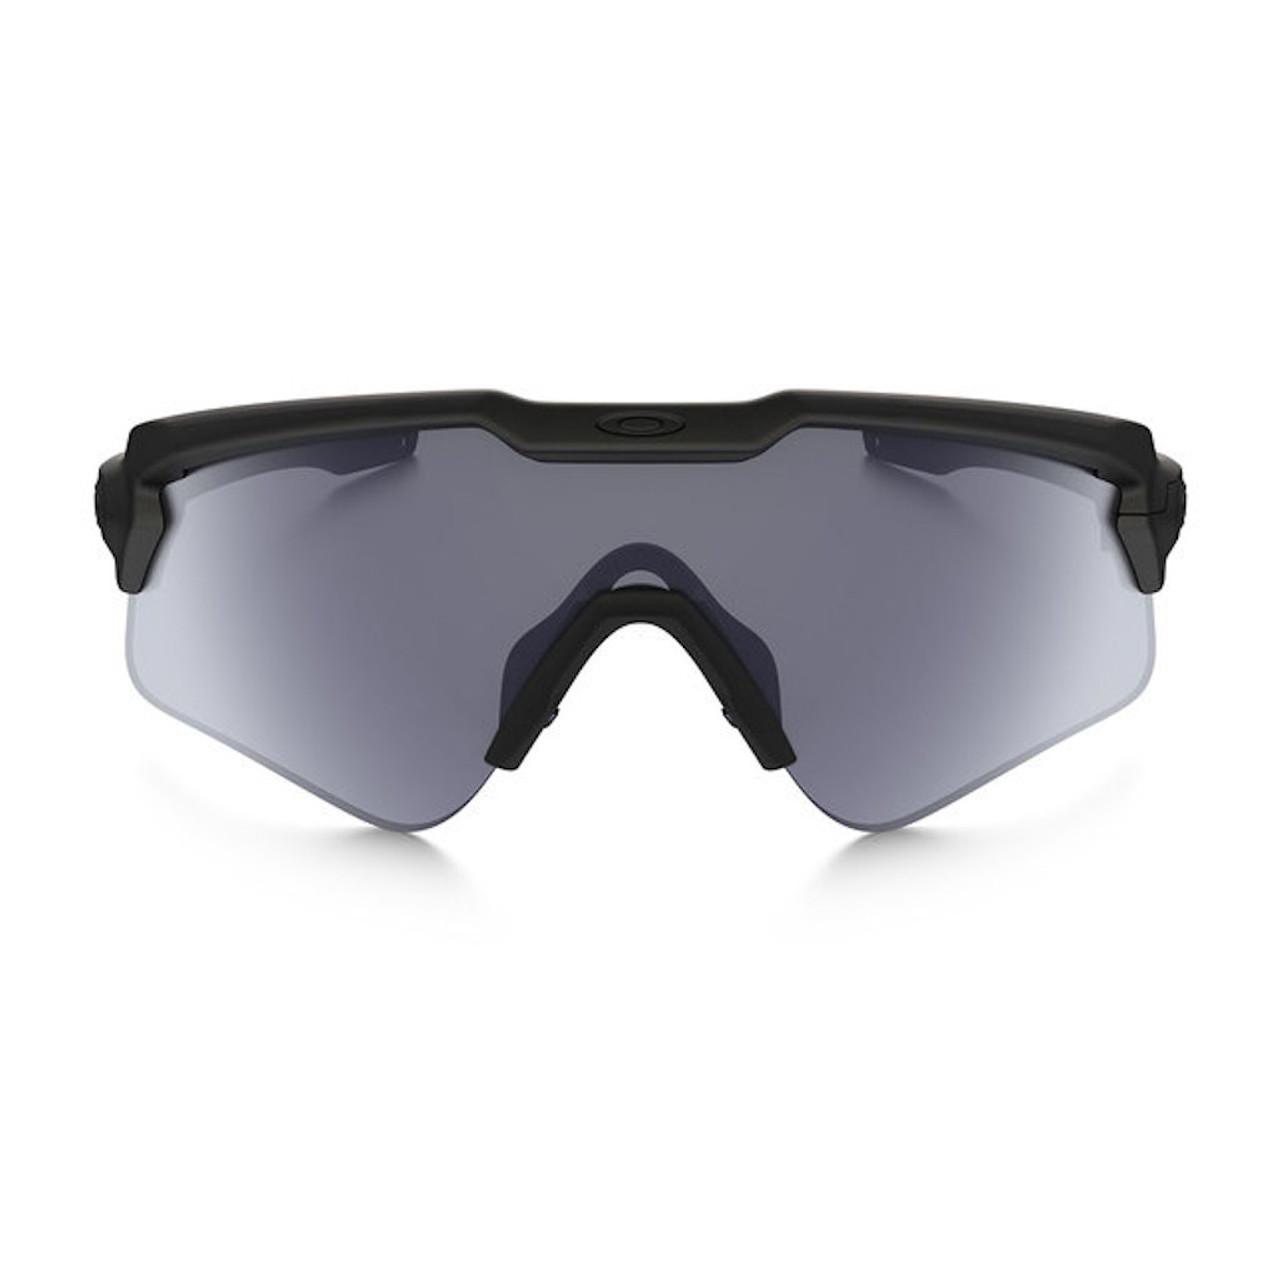 Oakley M Frame Lense - Shabooms